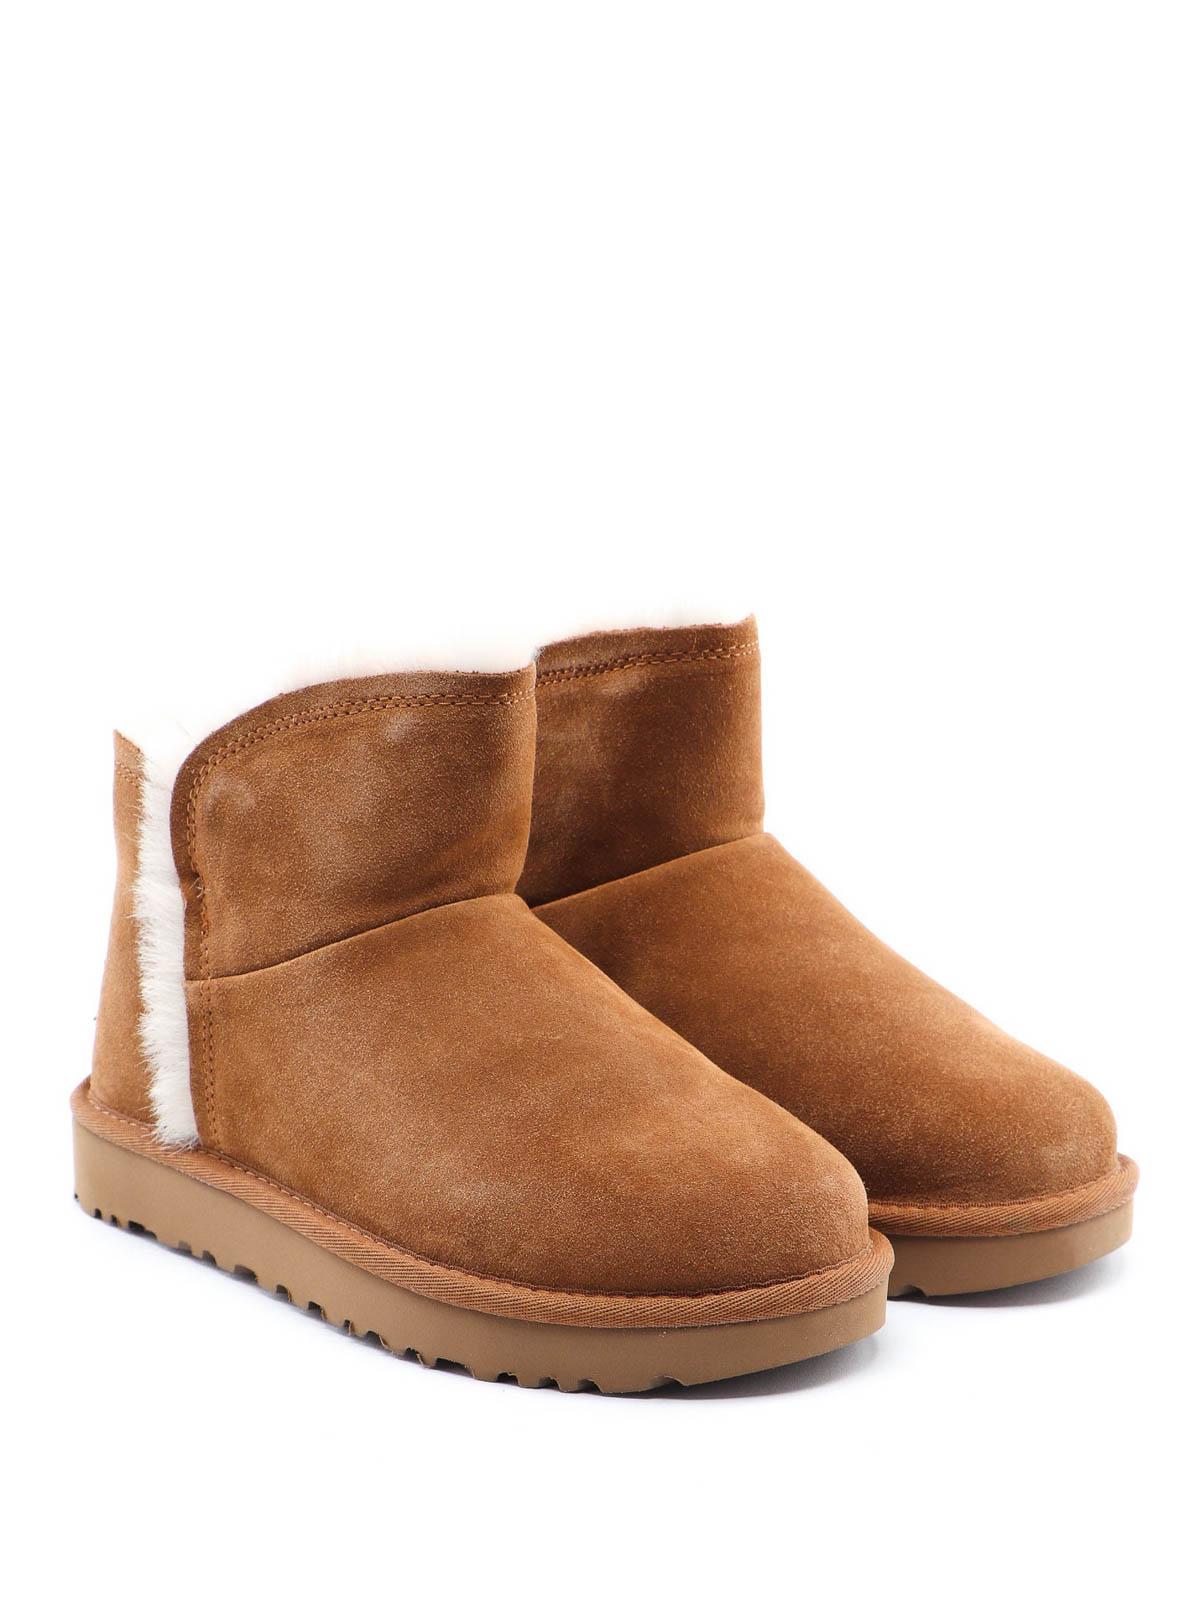 UGG Women's Classic Mini Fluff Hi Lo Sheepskin Boots